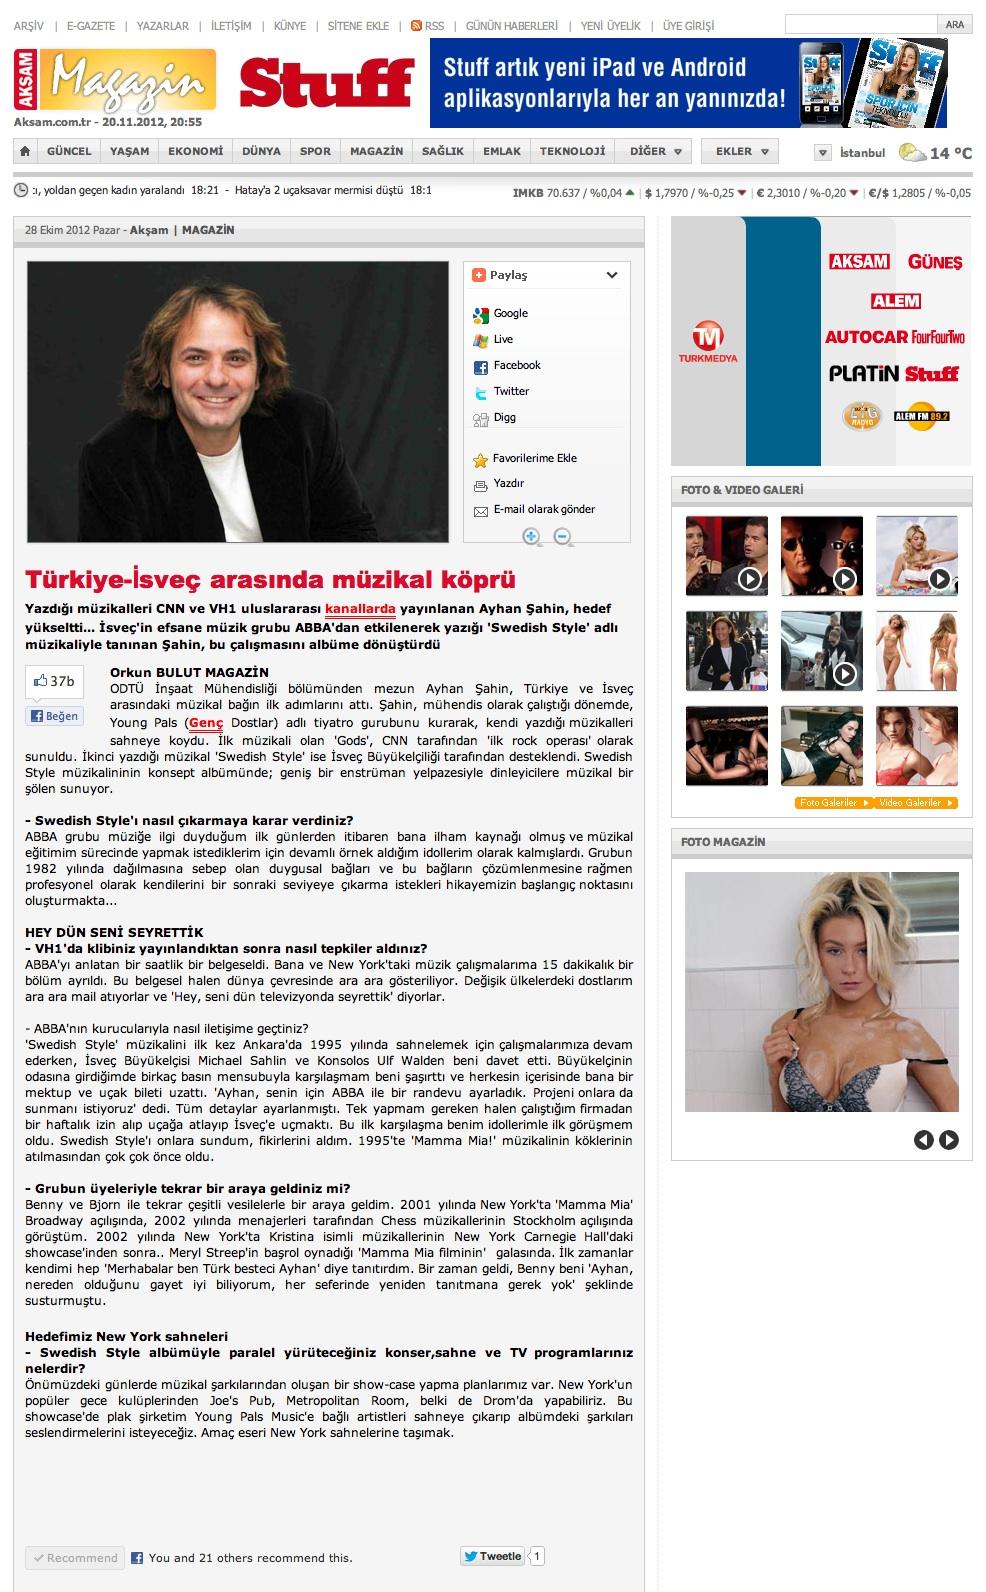 Aksam 10-28-2012 Swedish